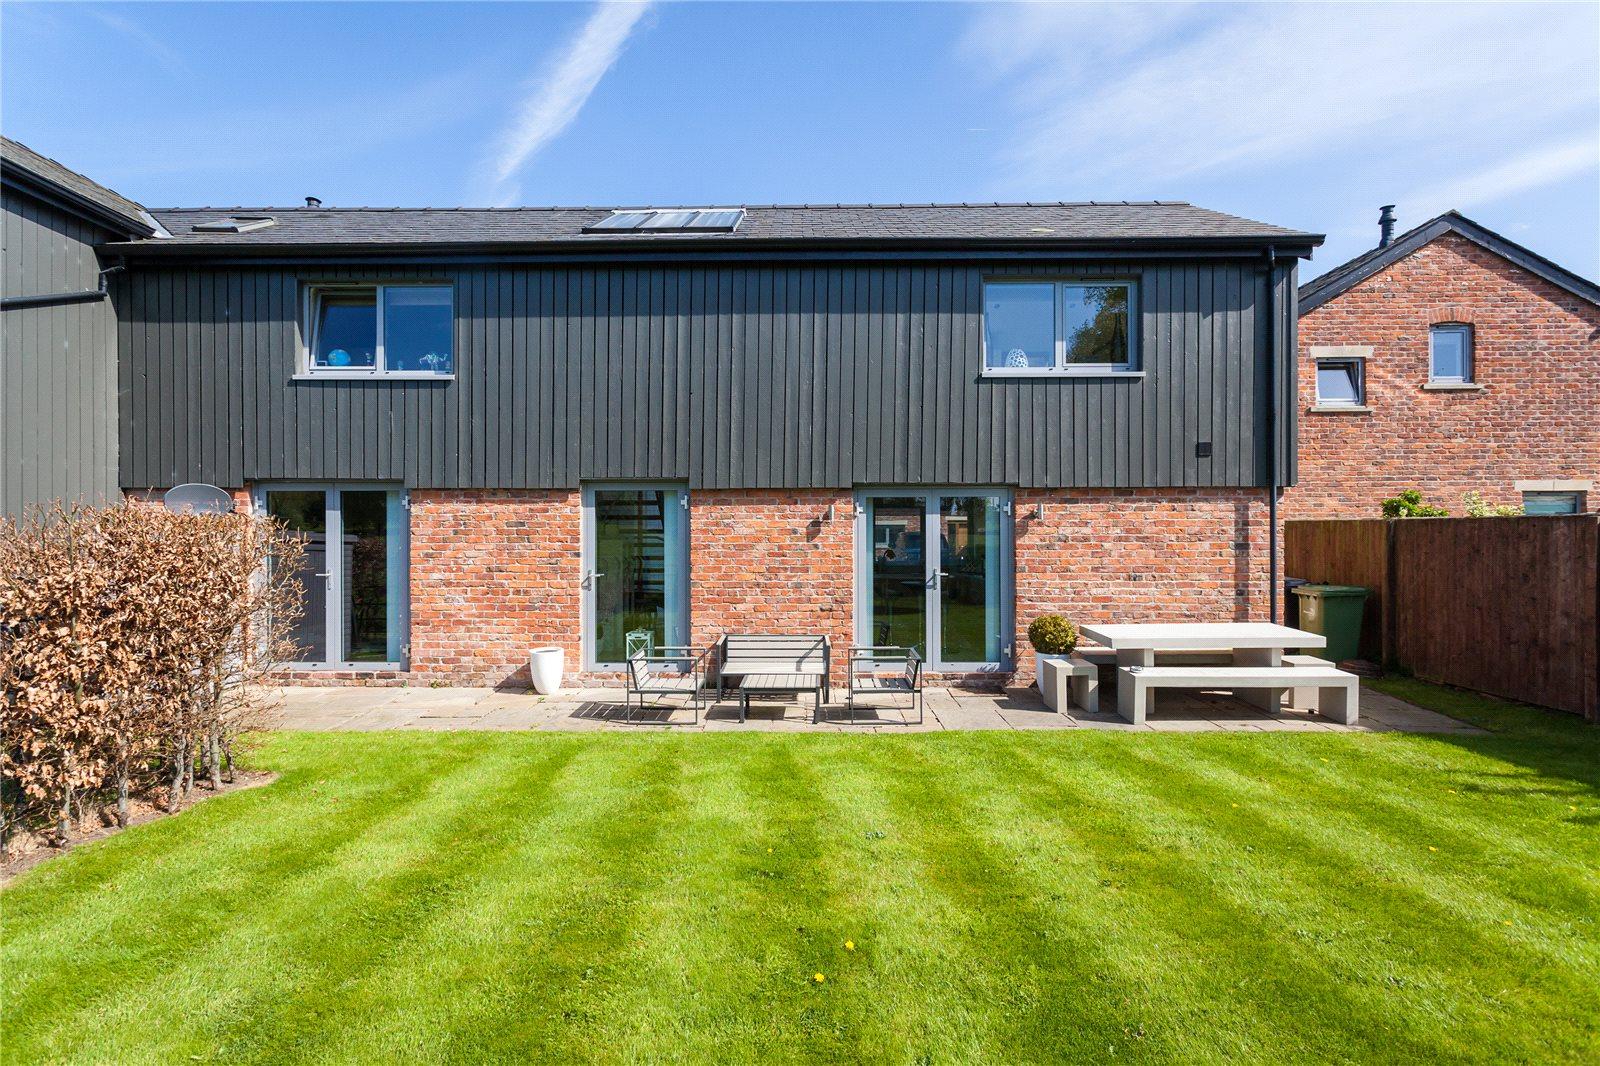 Jackson Stops 2 Bedroom Property For Sale In Harefield Farm